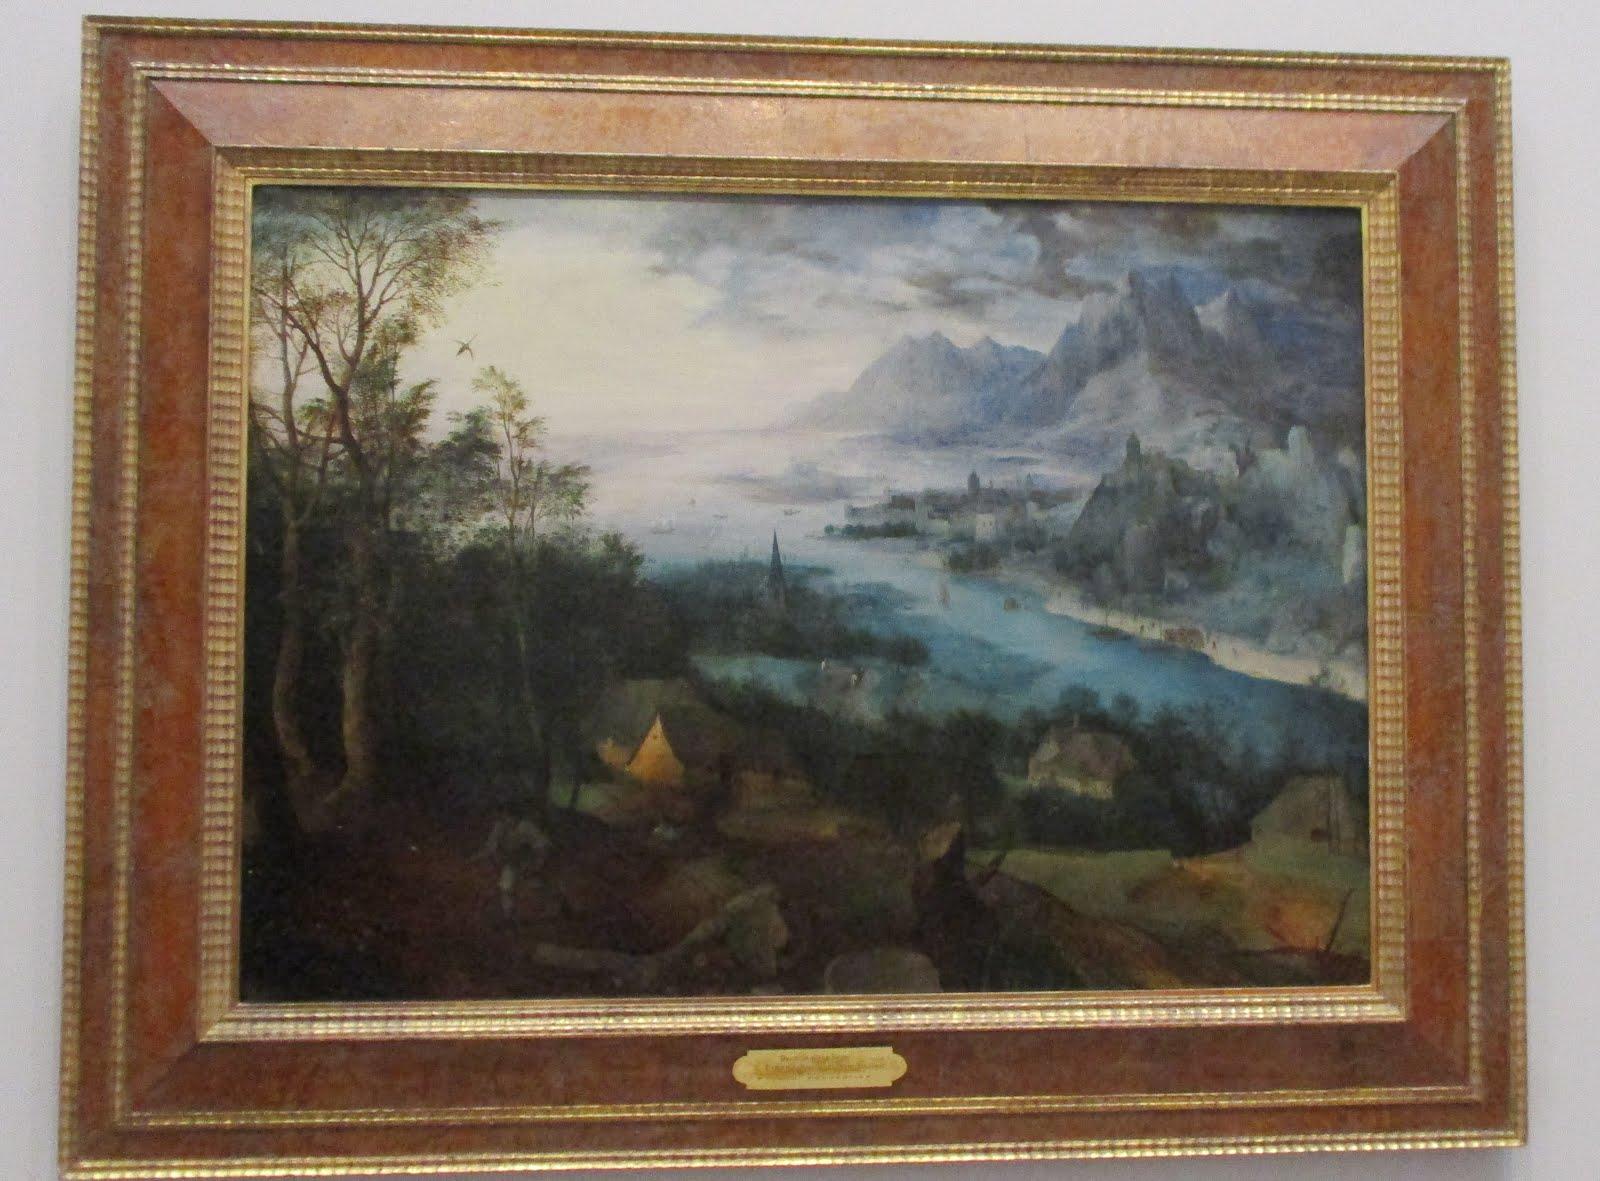 TIMKEN MUSEUM OF ART SAN-DIEGO CALIFORNIA